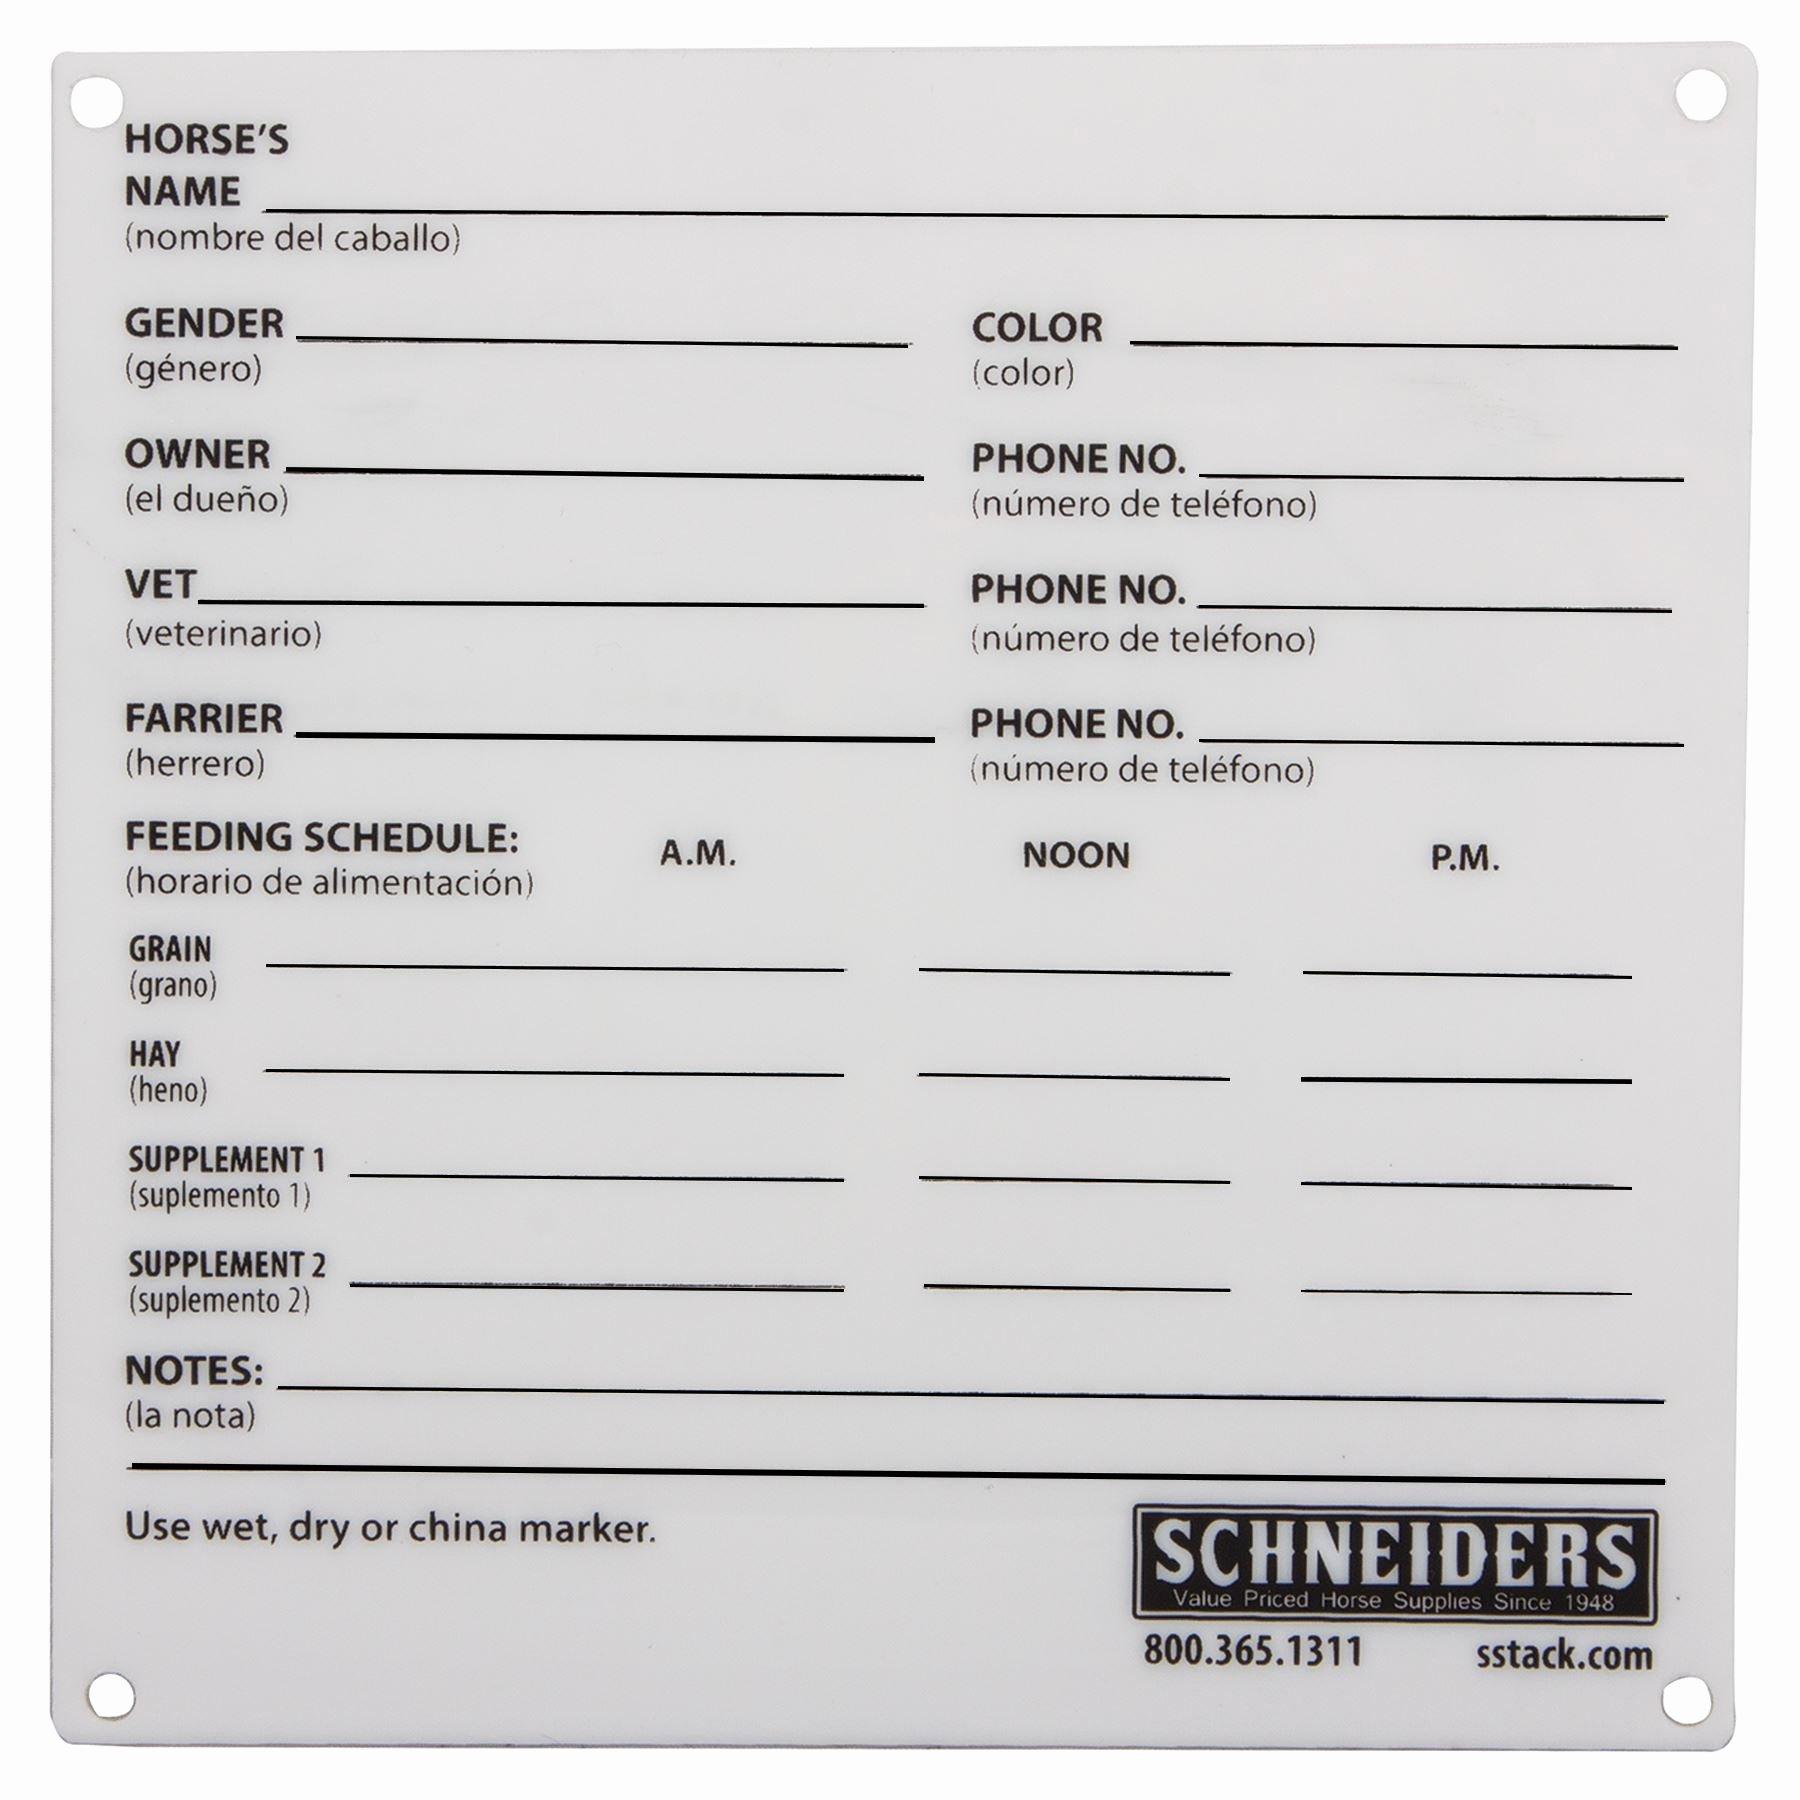 Information Card Template Unique Plexiglass Stall Information Card In Stable at Schneider